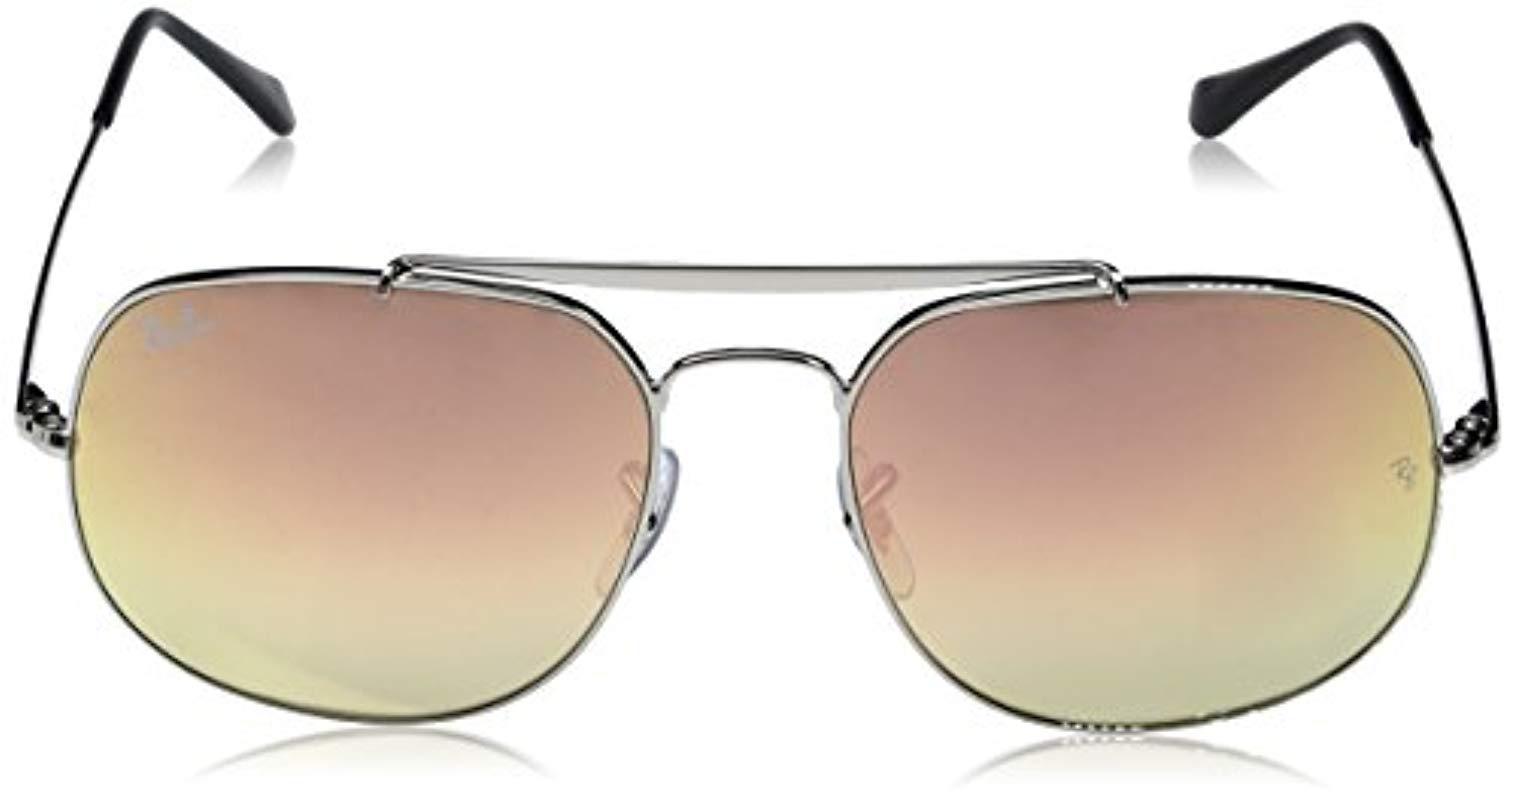 5f8543da2f Ray-Ban - Metallic Rb3561 The General Sunglasses for Men - Lyst. View  fullscreen